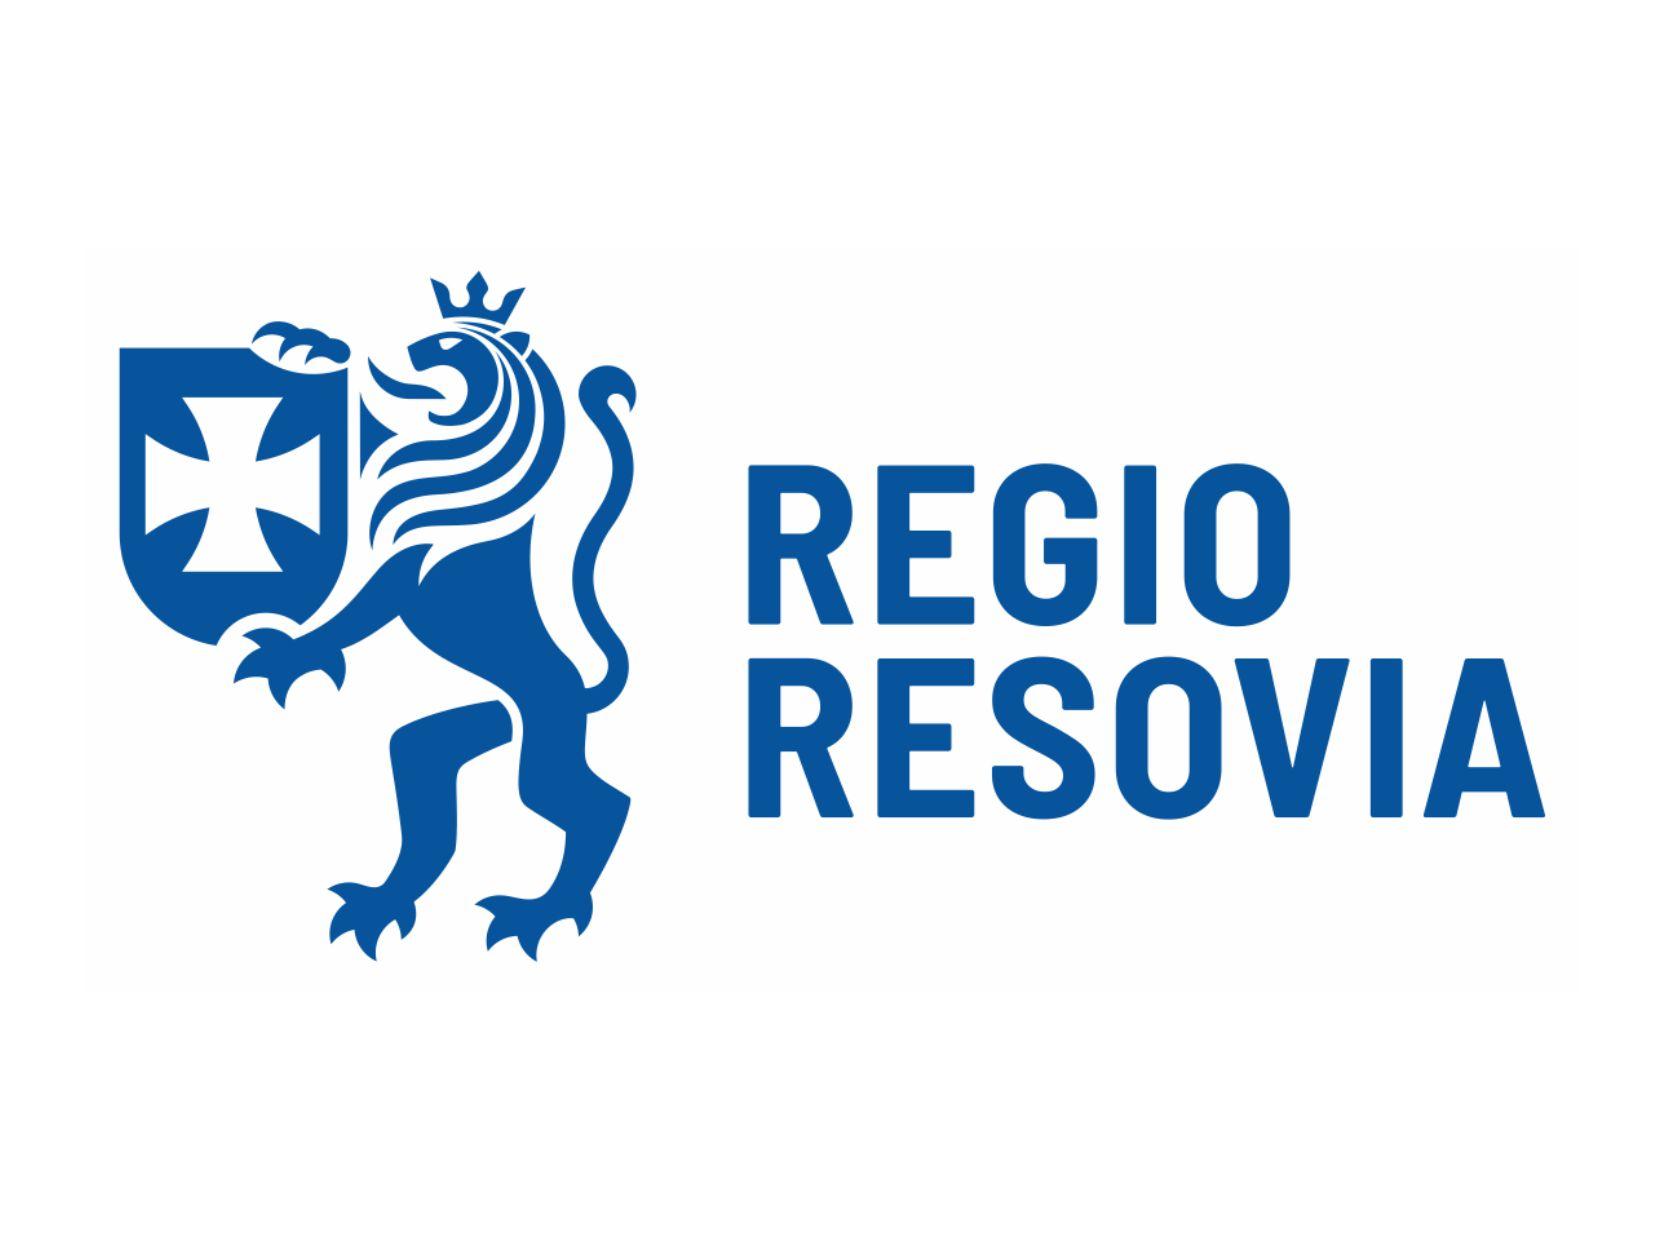 Regio Resovia